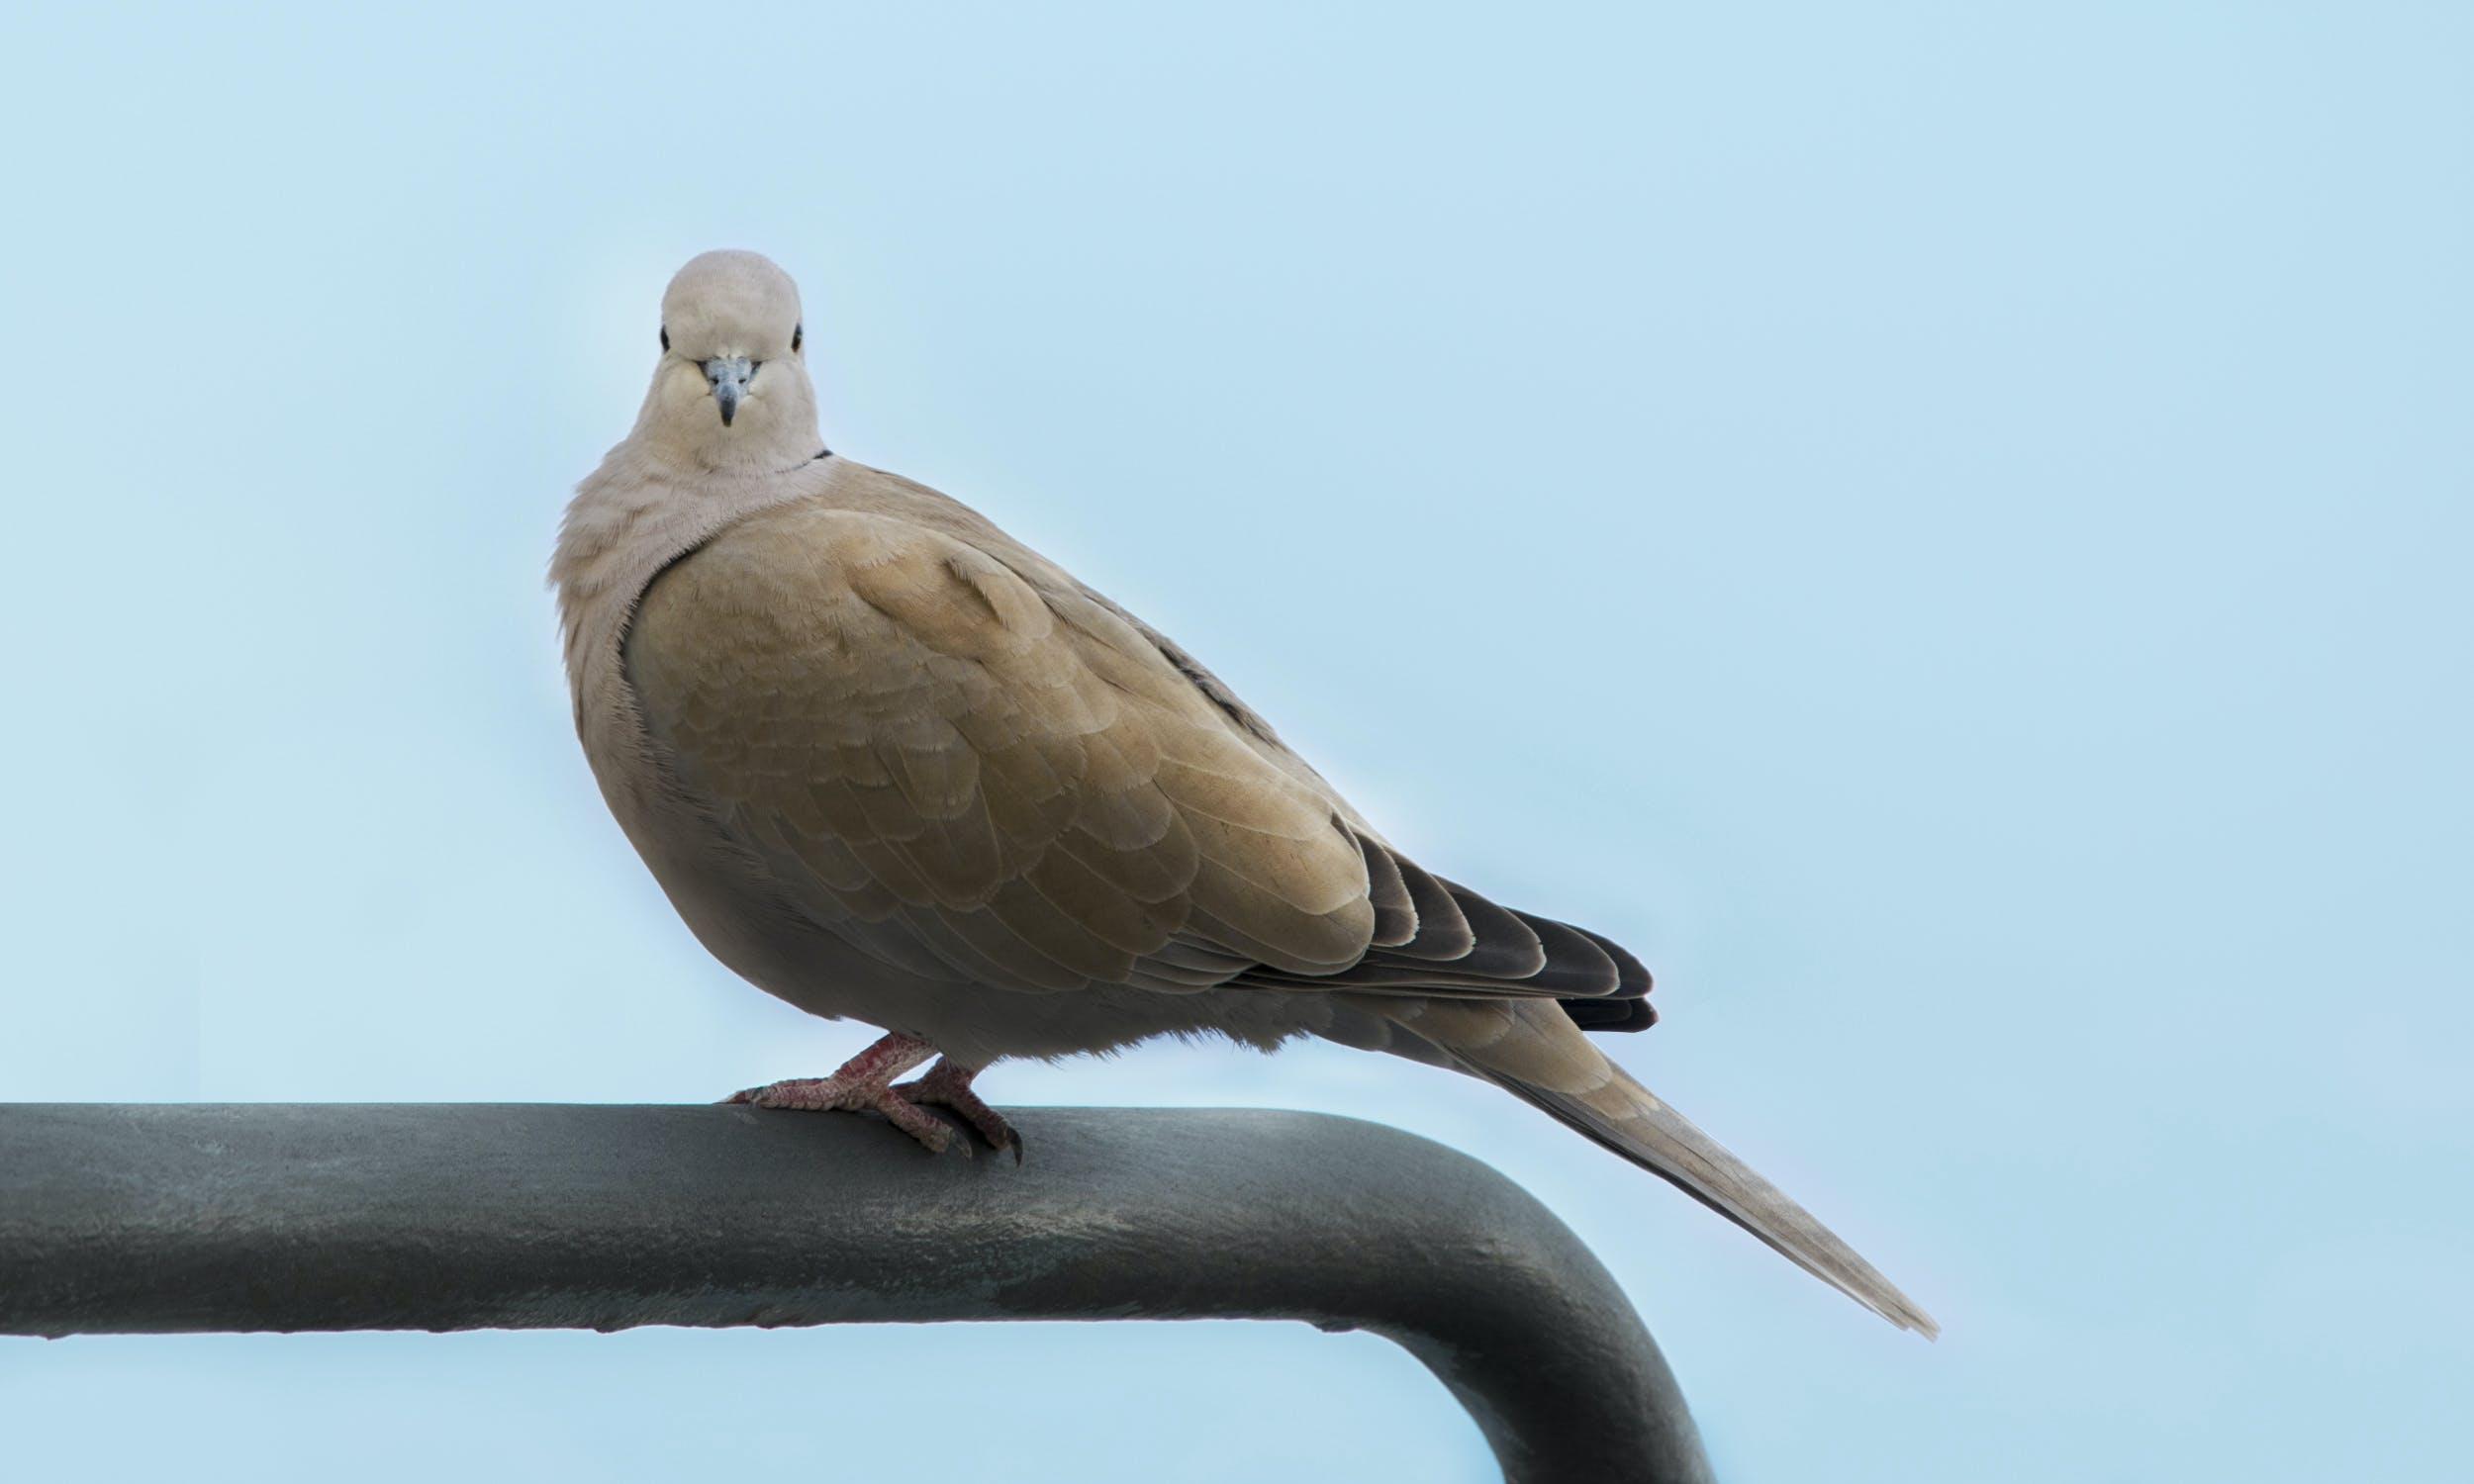 blue, pigeon